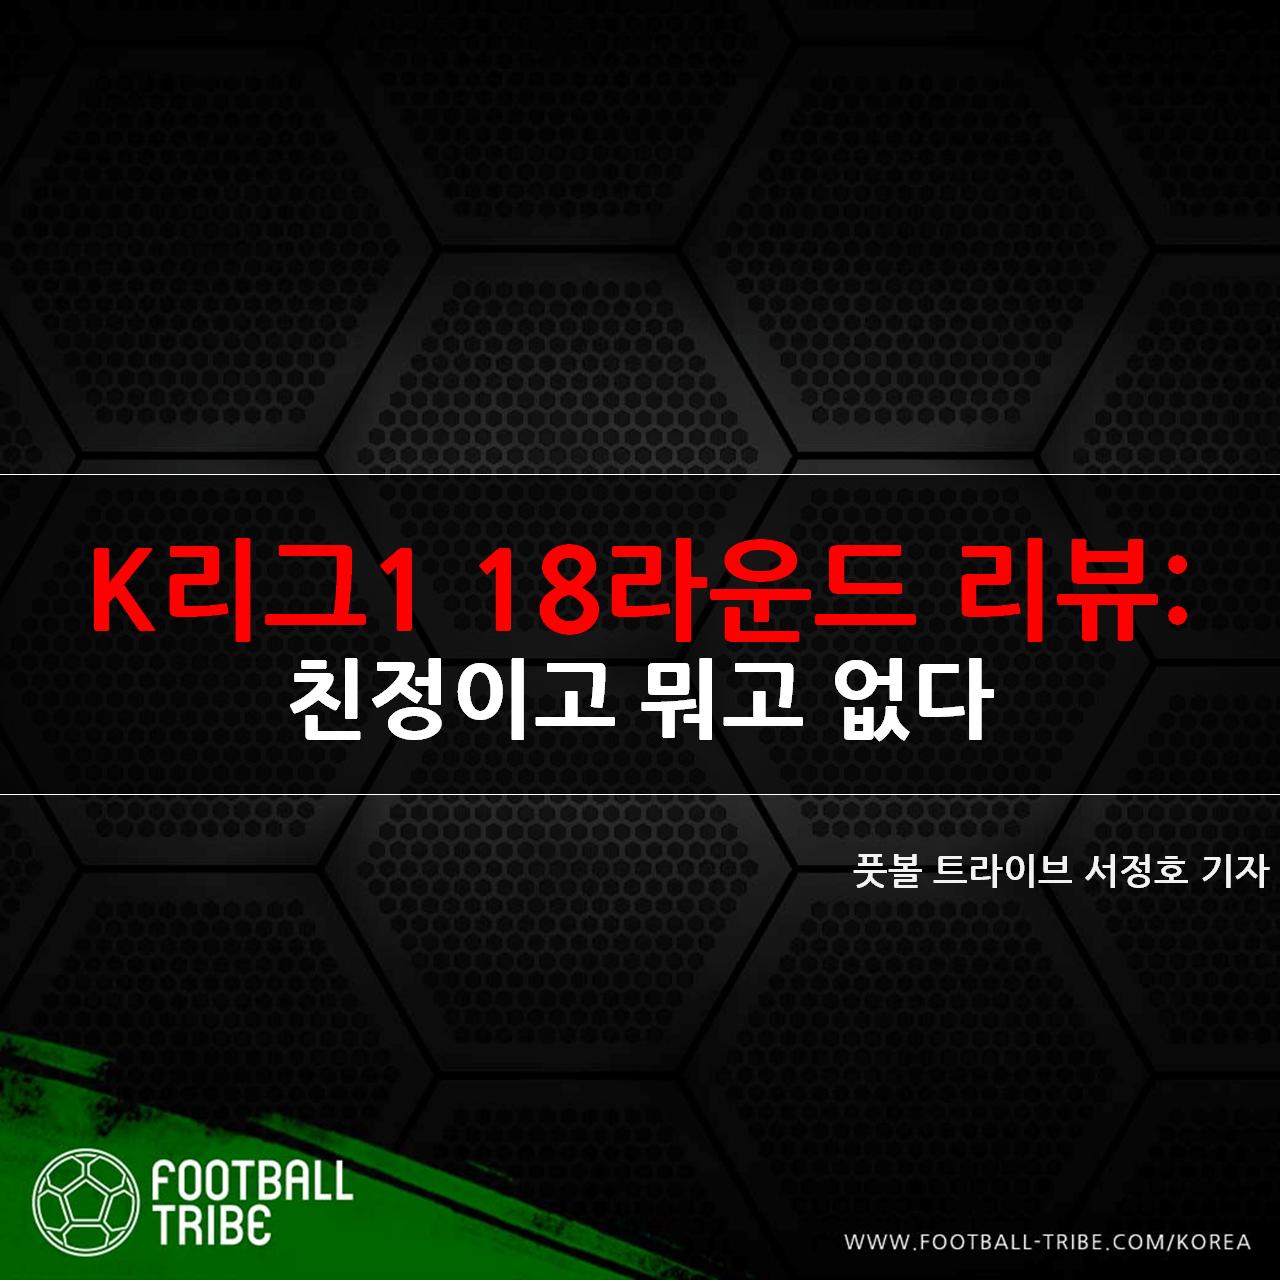 [K리그1 18라운드 리뷰] 친정이고 뭐고 없다